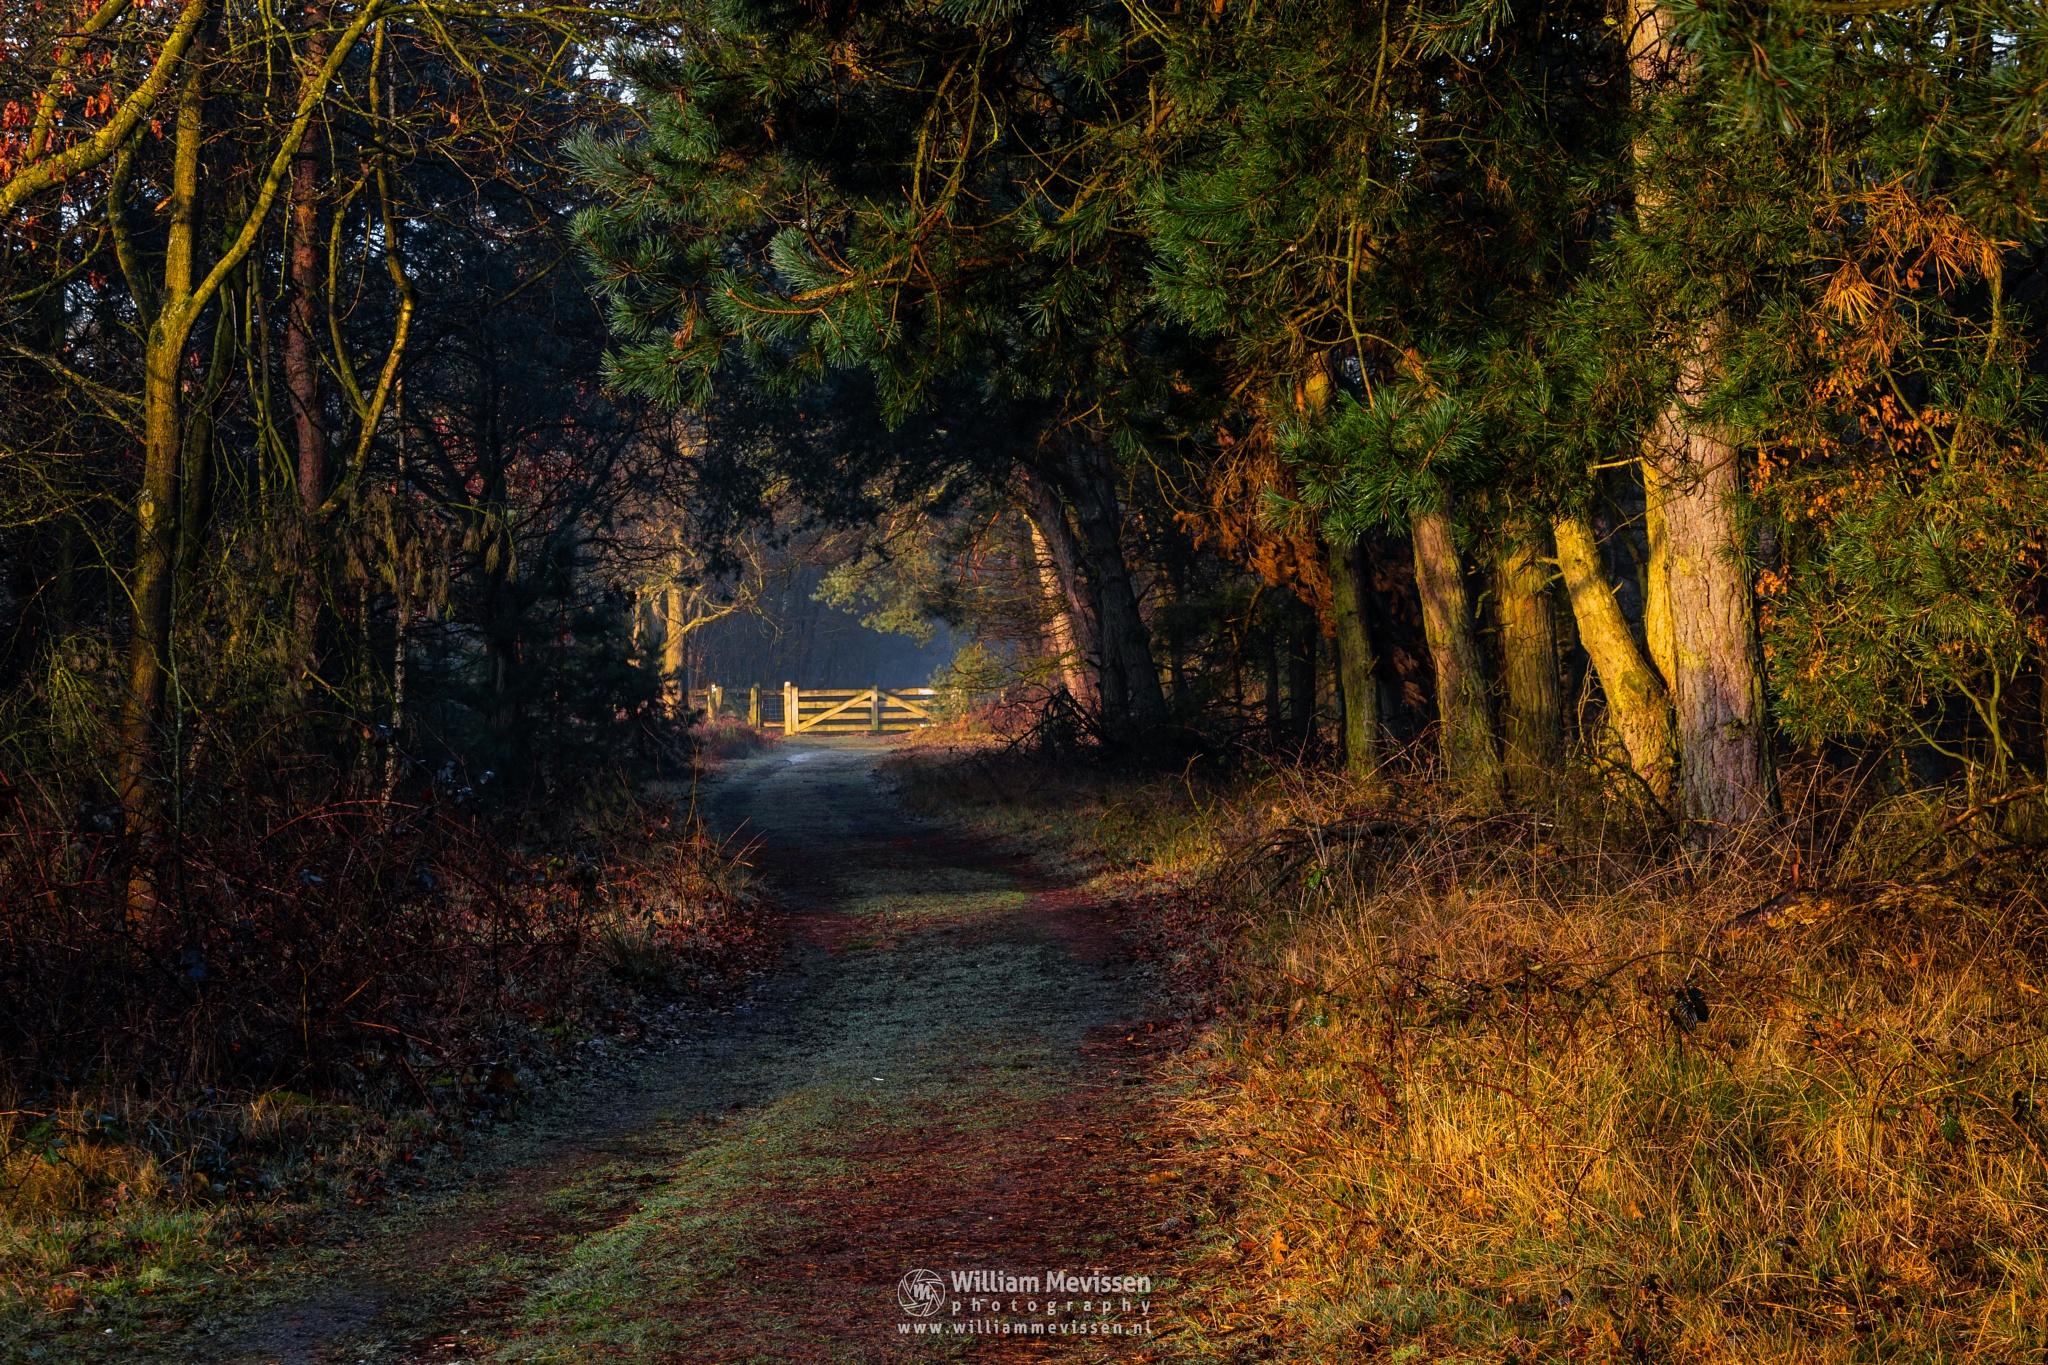 Sunrise Gate by William Mevissen